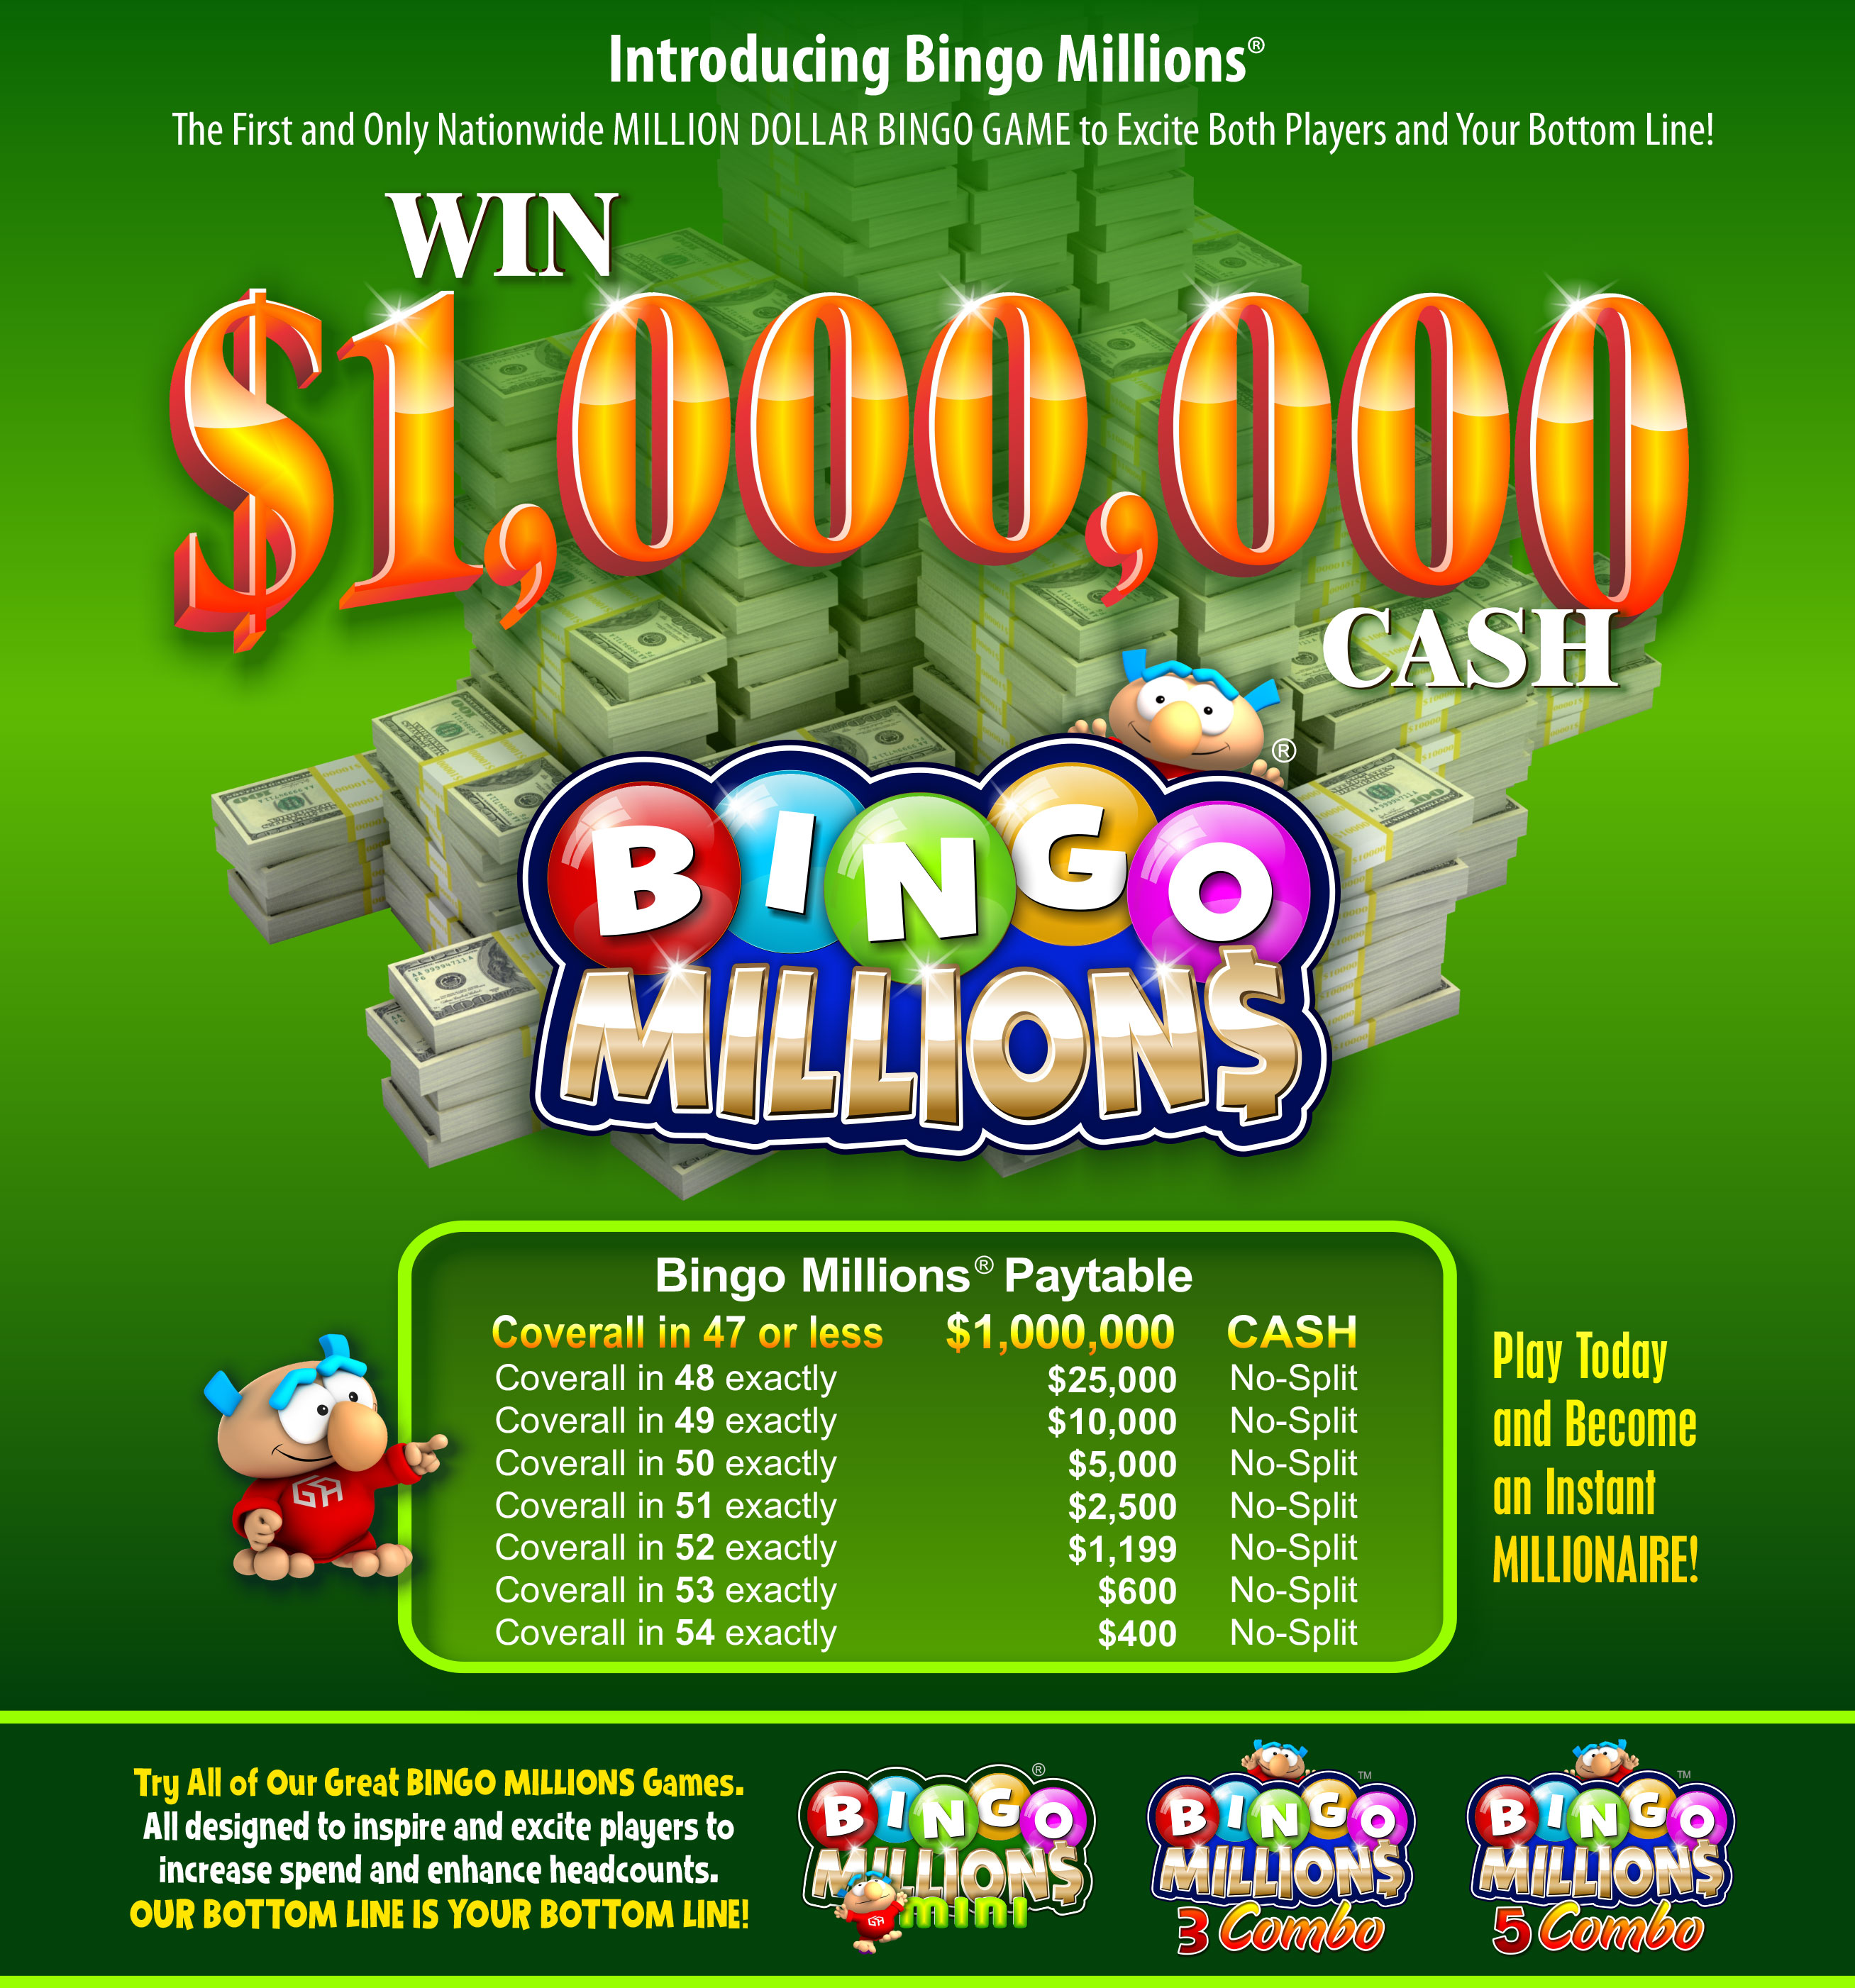 bingo-millions robinson rancheria casino bingo